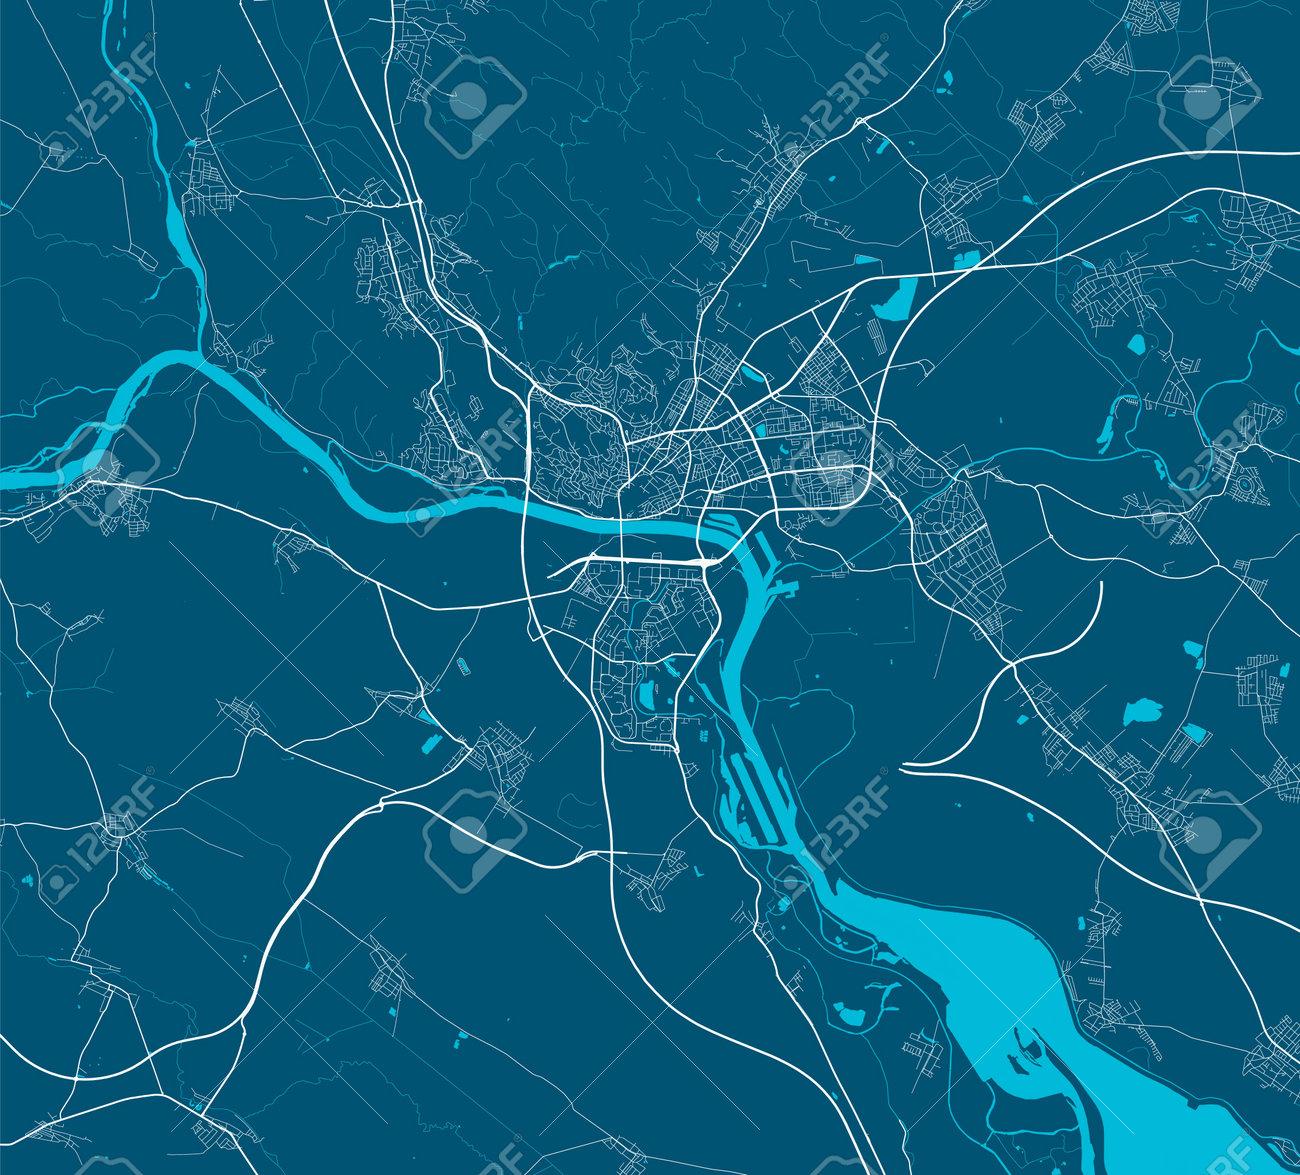 Vector map of Bratislava. Street map poster illustration. Bratislava map art. - 161392718